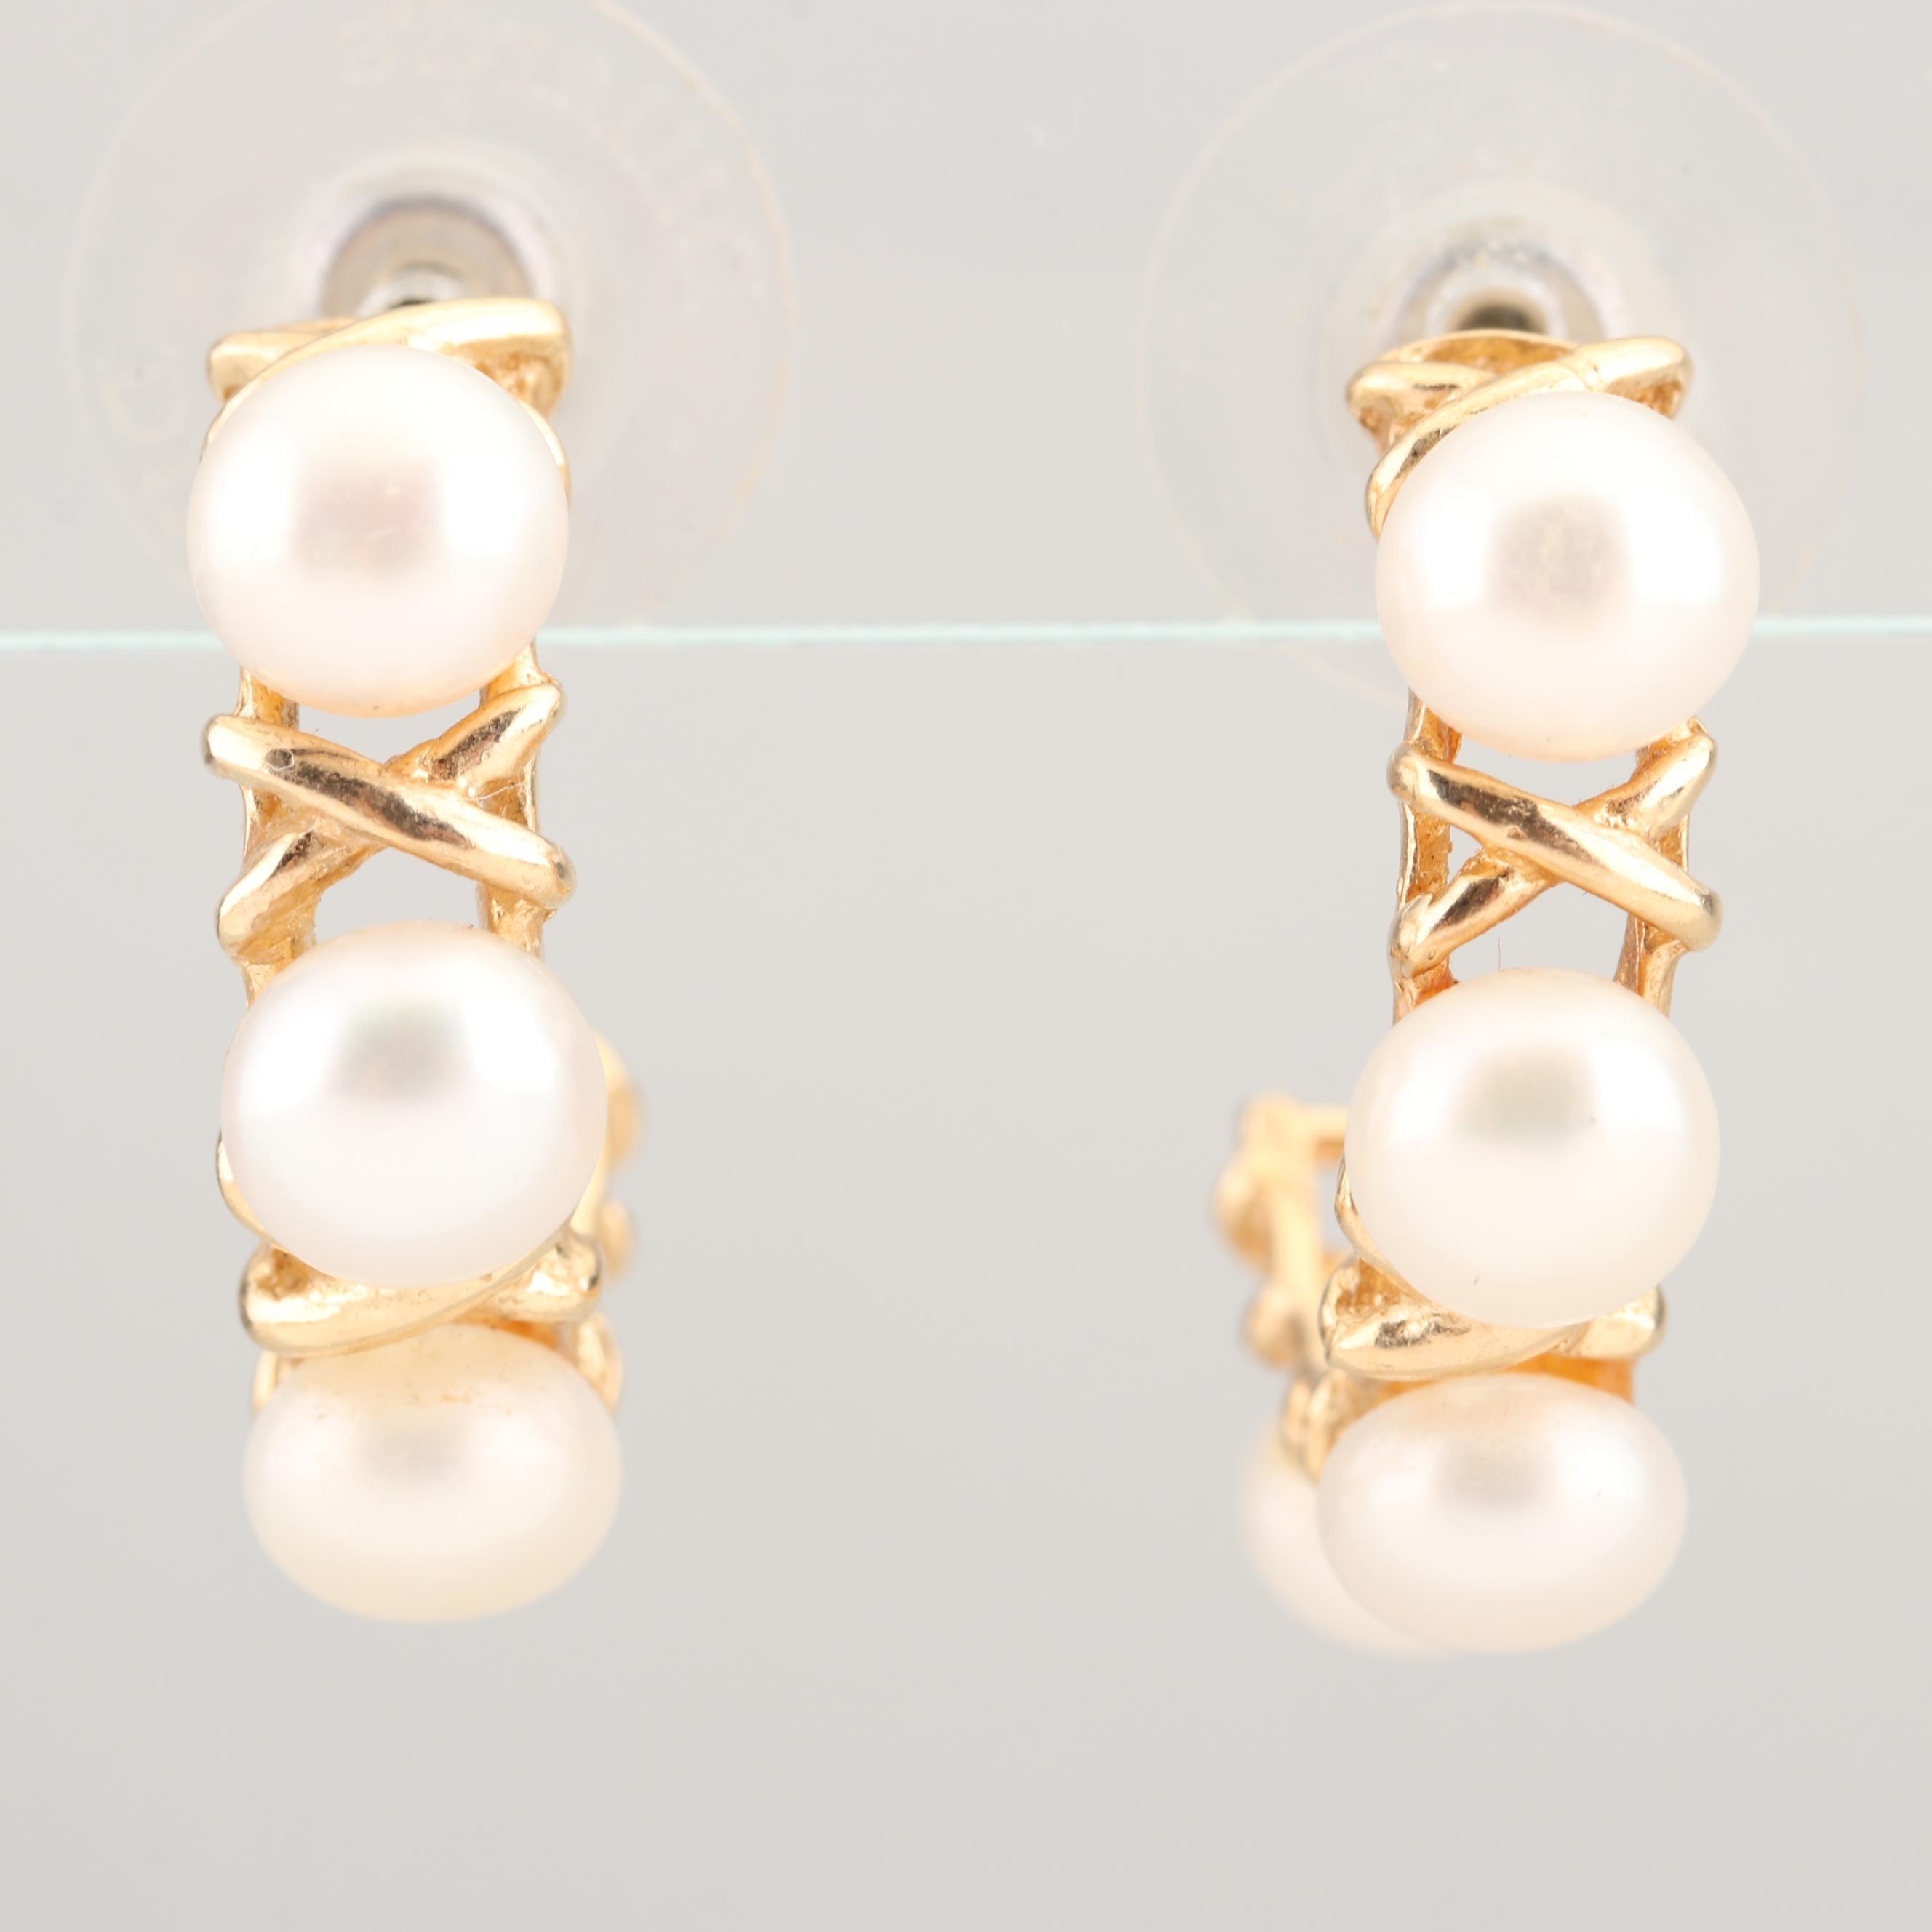 14K Yellow Gold Freshwater Cultured Pearl Earrings